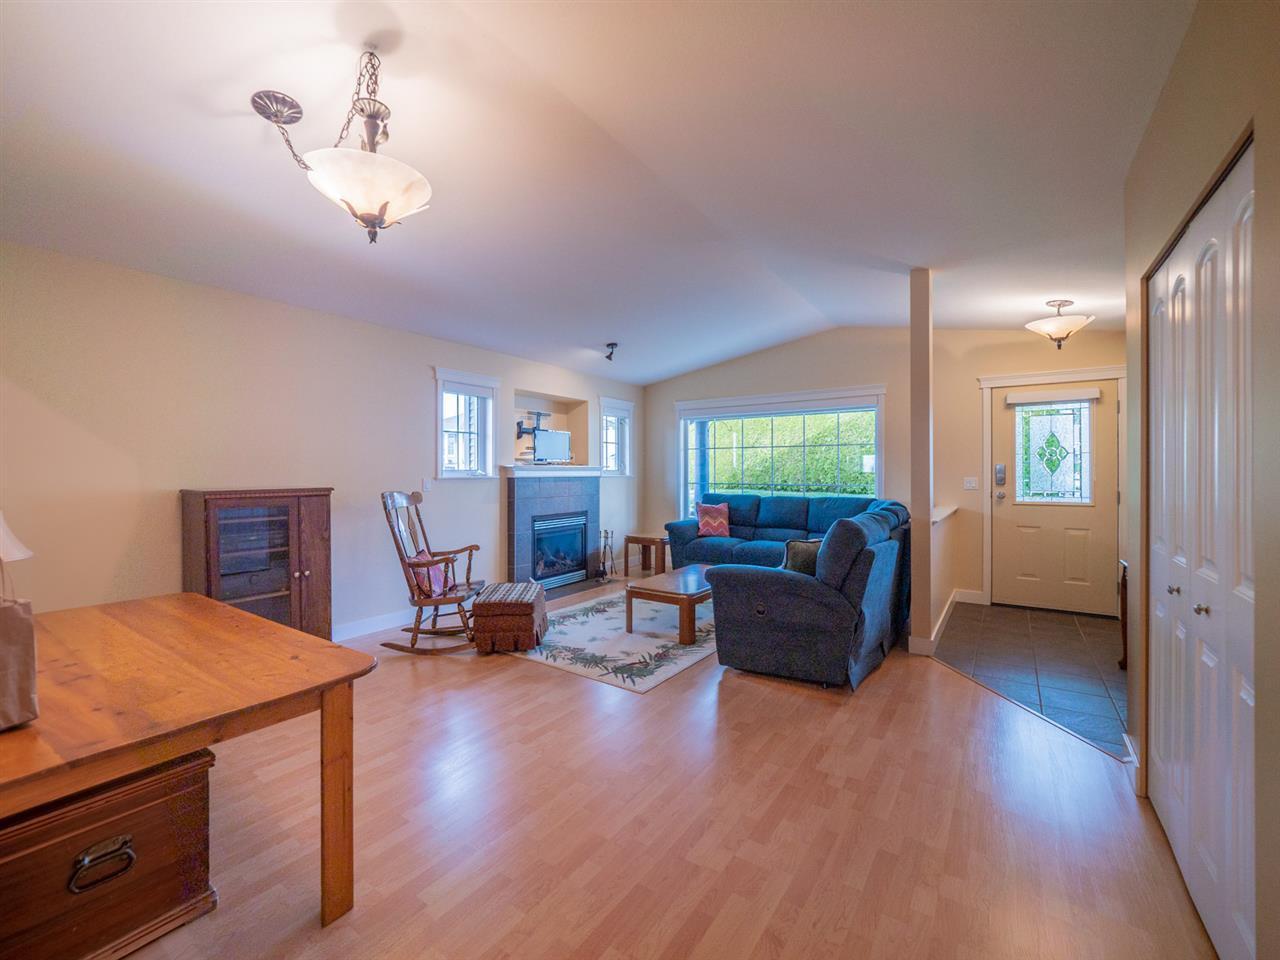 Photo 7: Photos: 5708 EMILY Way in Sechelt: Sechelt District House for sale (Sunshine Coast)  : MLS®# R2328606